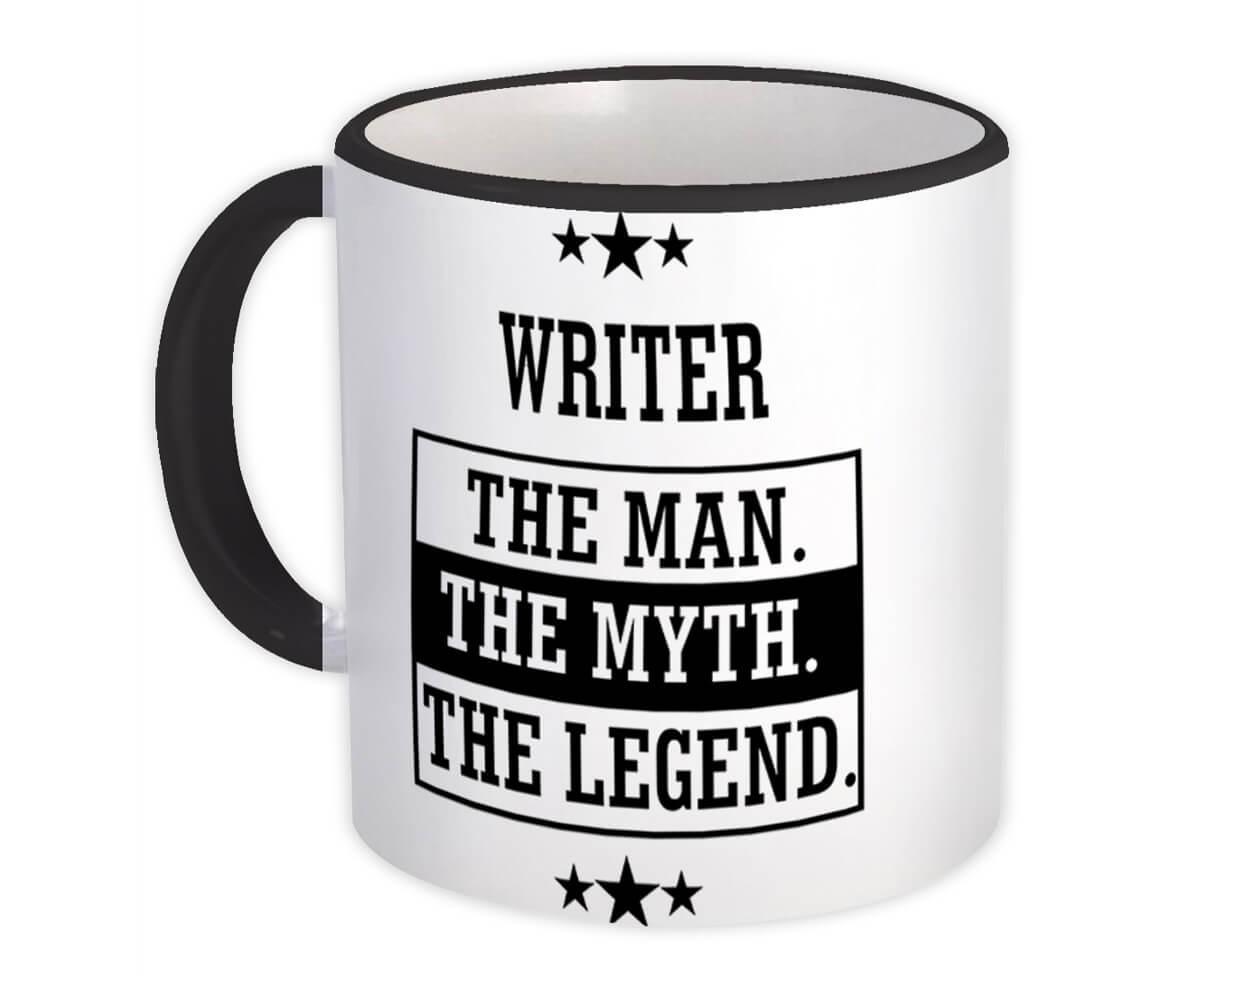 WRITER : Gift Mug The Man Myth Legend Office Work Christmas